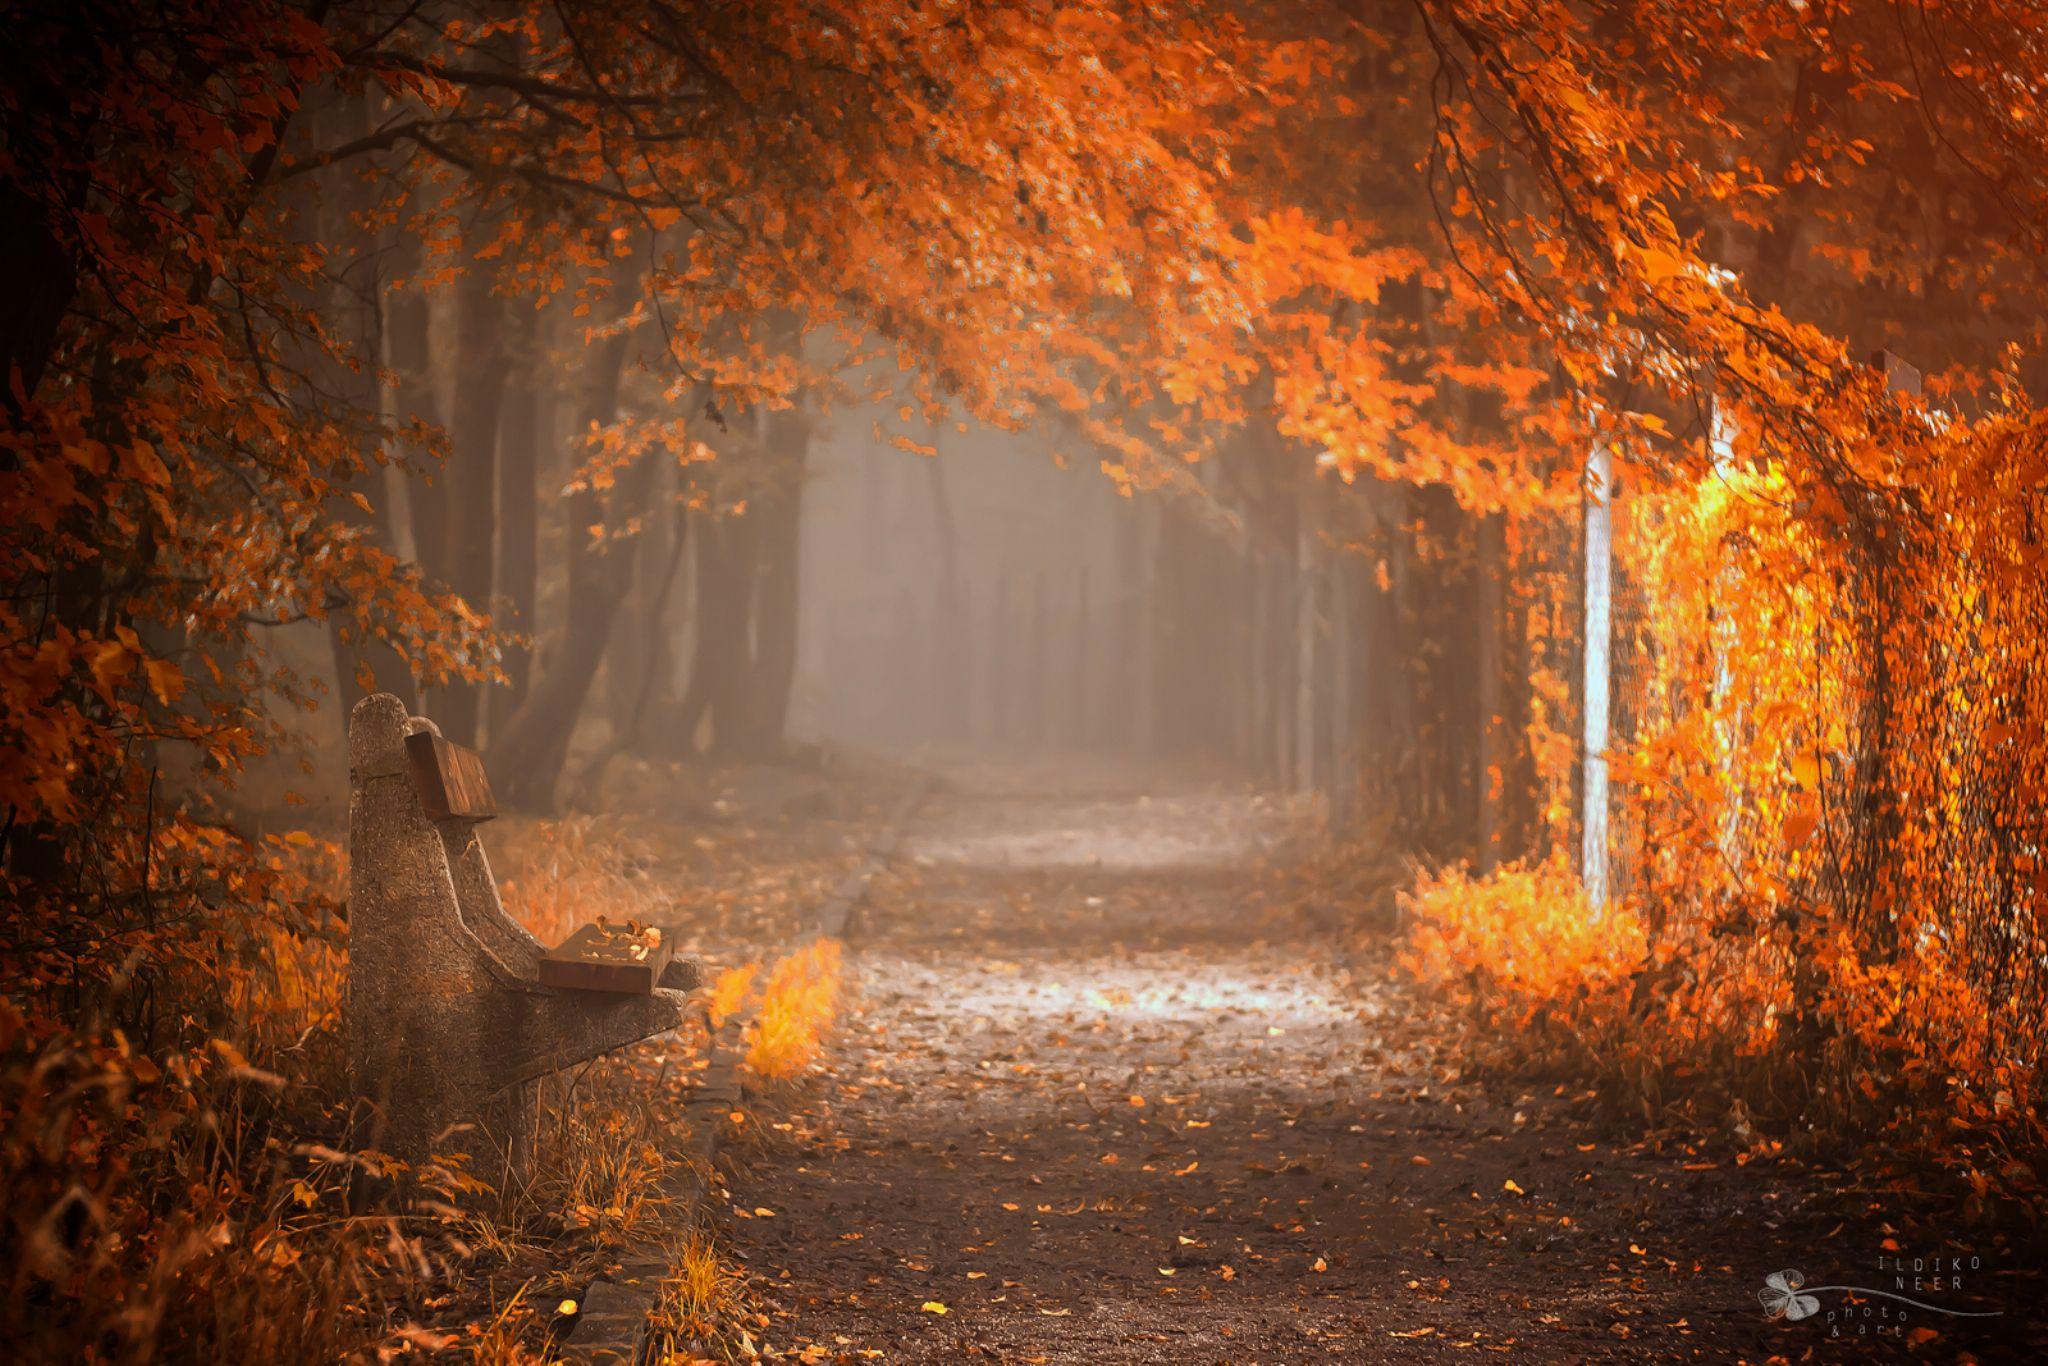 Waiting to Fall by Ildiko Neer